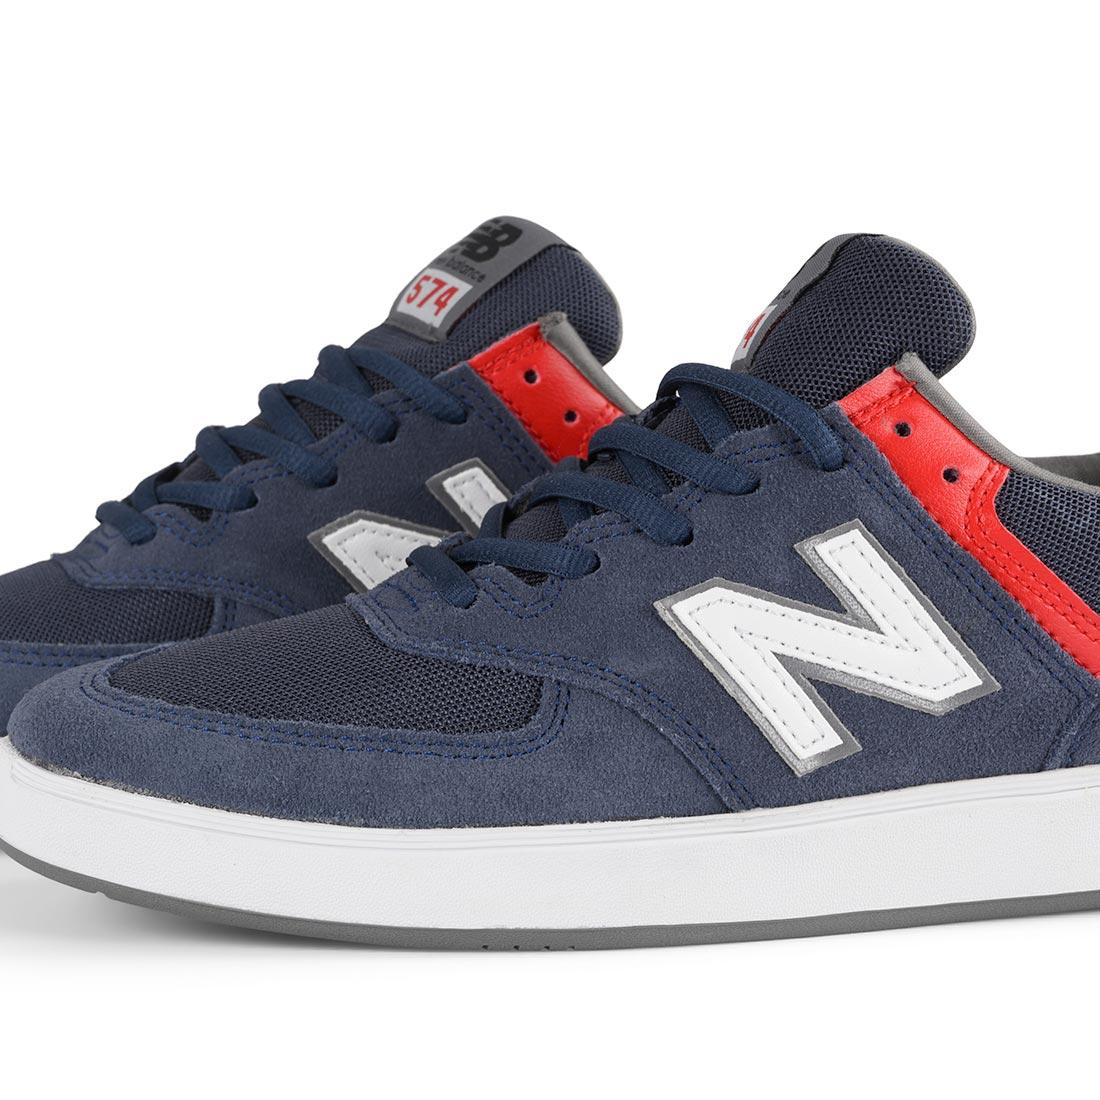 41b8f68d7bd76 New Balance All Coasts 574 Shoes - Navy / White